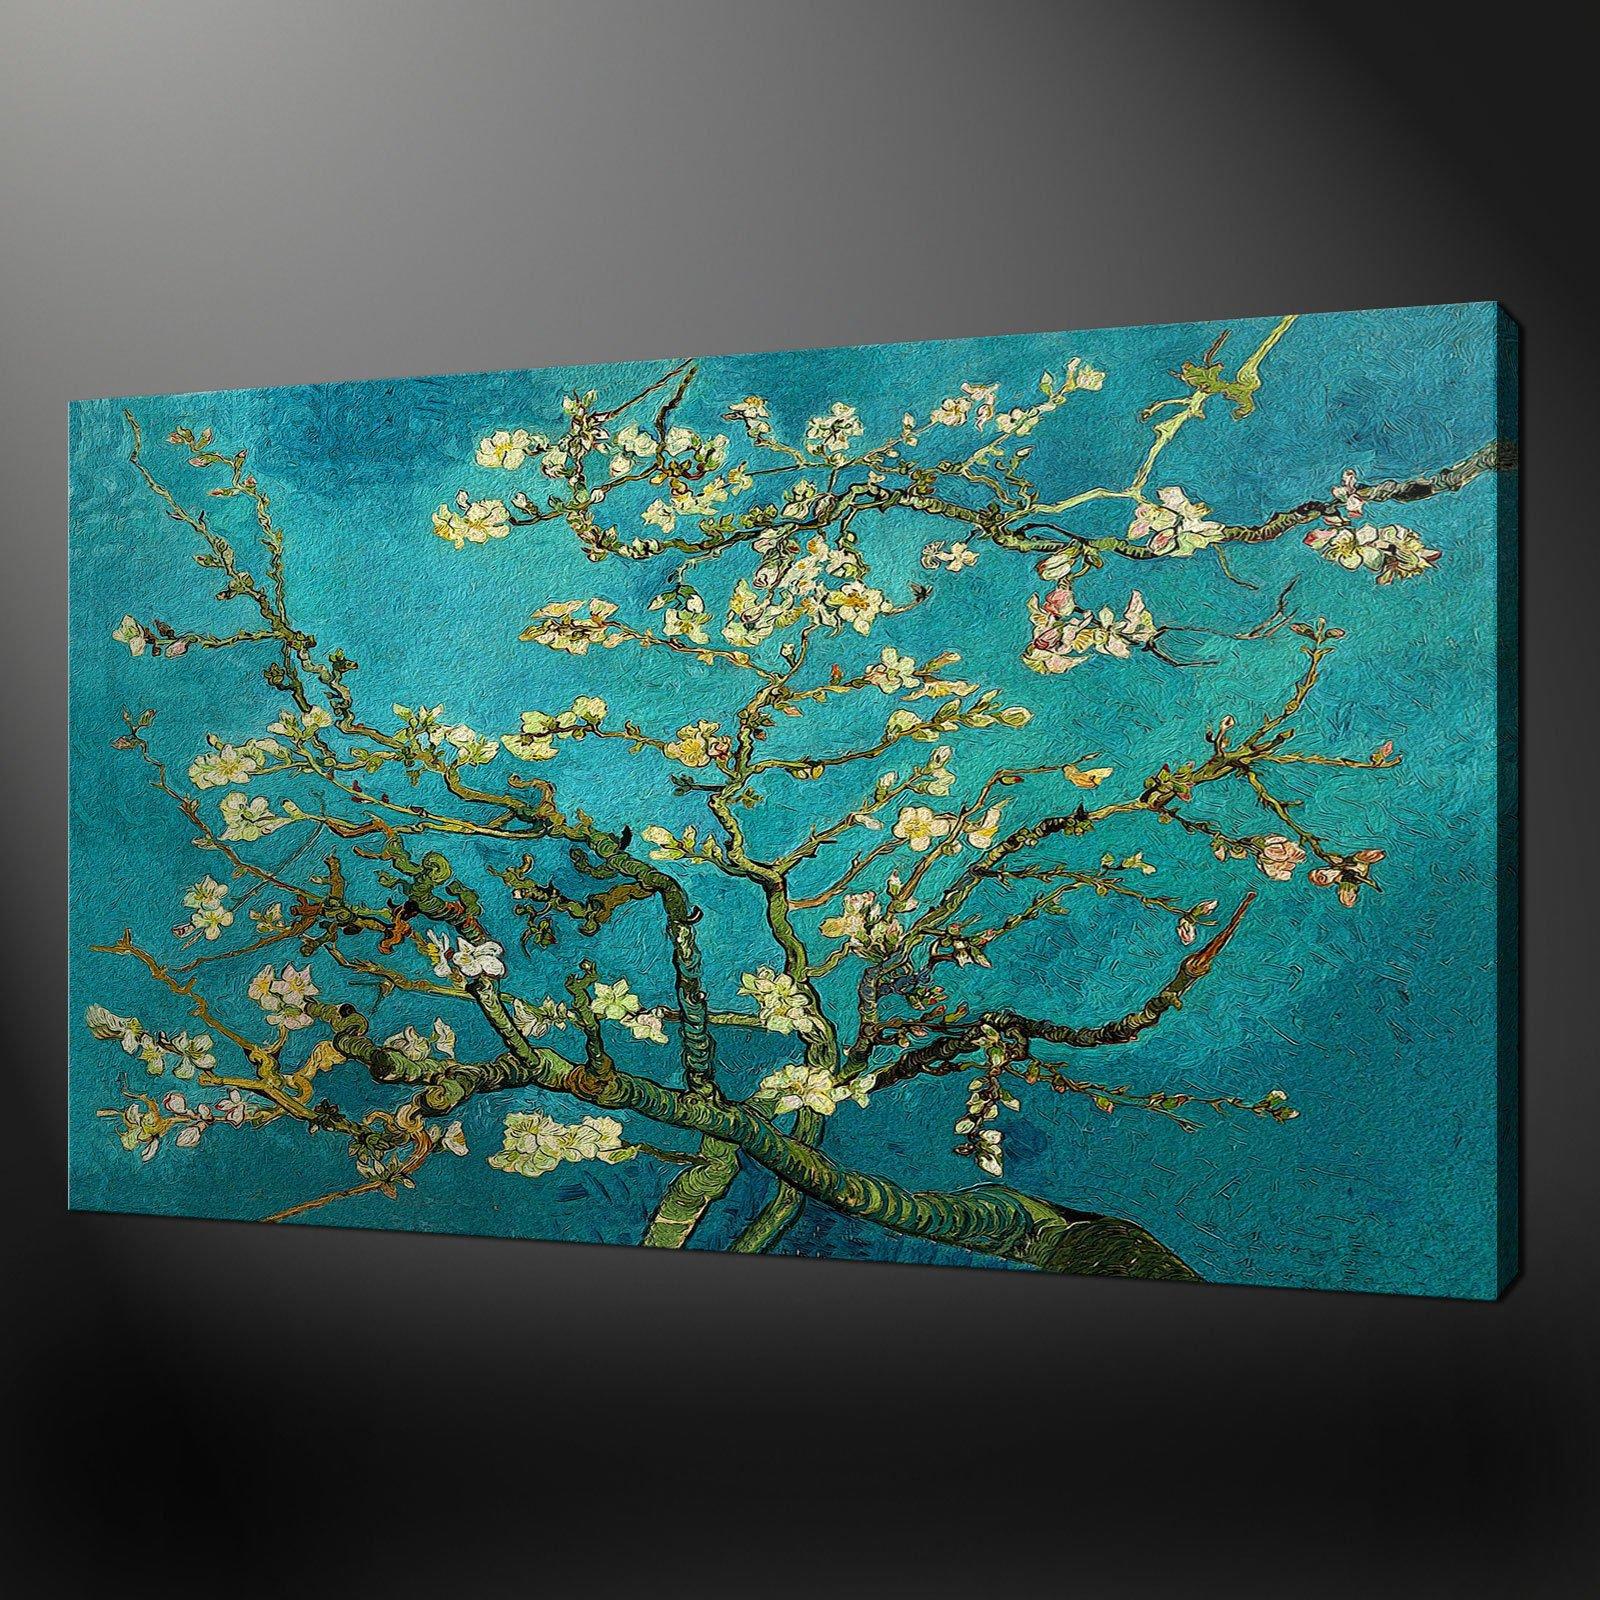 Almond tree van gogh canvas wall art pictures prints 20 x 16 inch free uk p p canvas print art - Wall decor art canvas ...